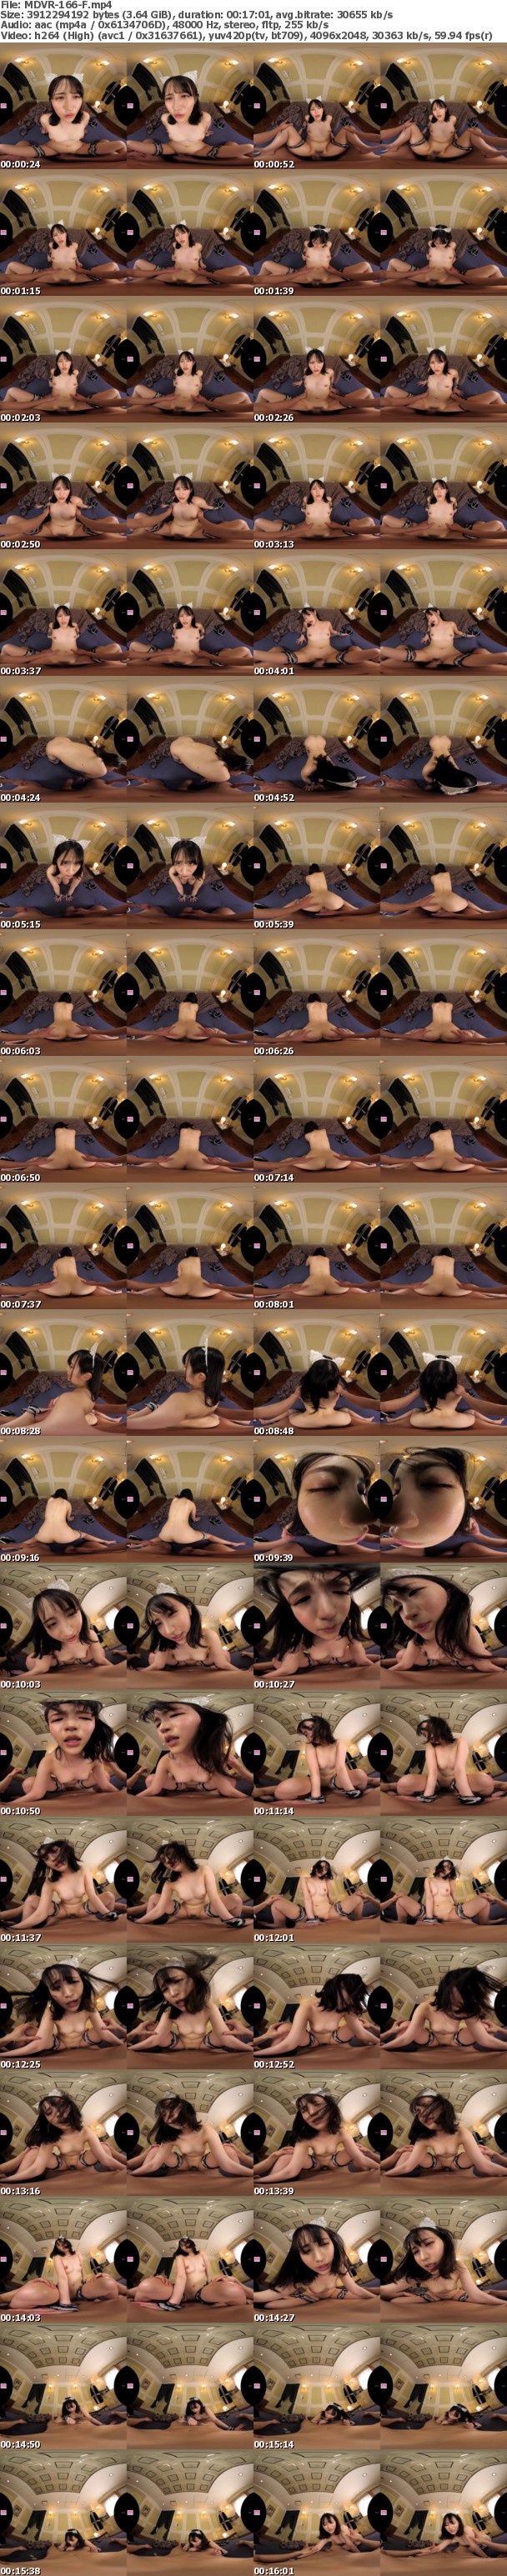 (VR) MDVR-166 【HQ超高画質】小野六花VR第2弾!フェラでもマ●コでも射精シーンたっぷり2SEX長尺148分! 洗体・添い寝手コキなどアナタの為に尽くすりっかたん!王様気分で美少女メイドをご堪能ください!